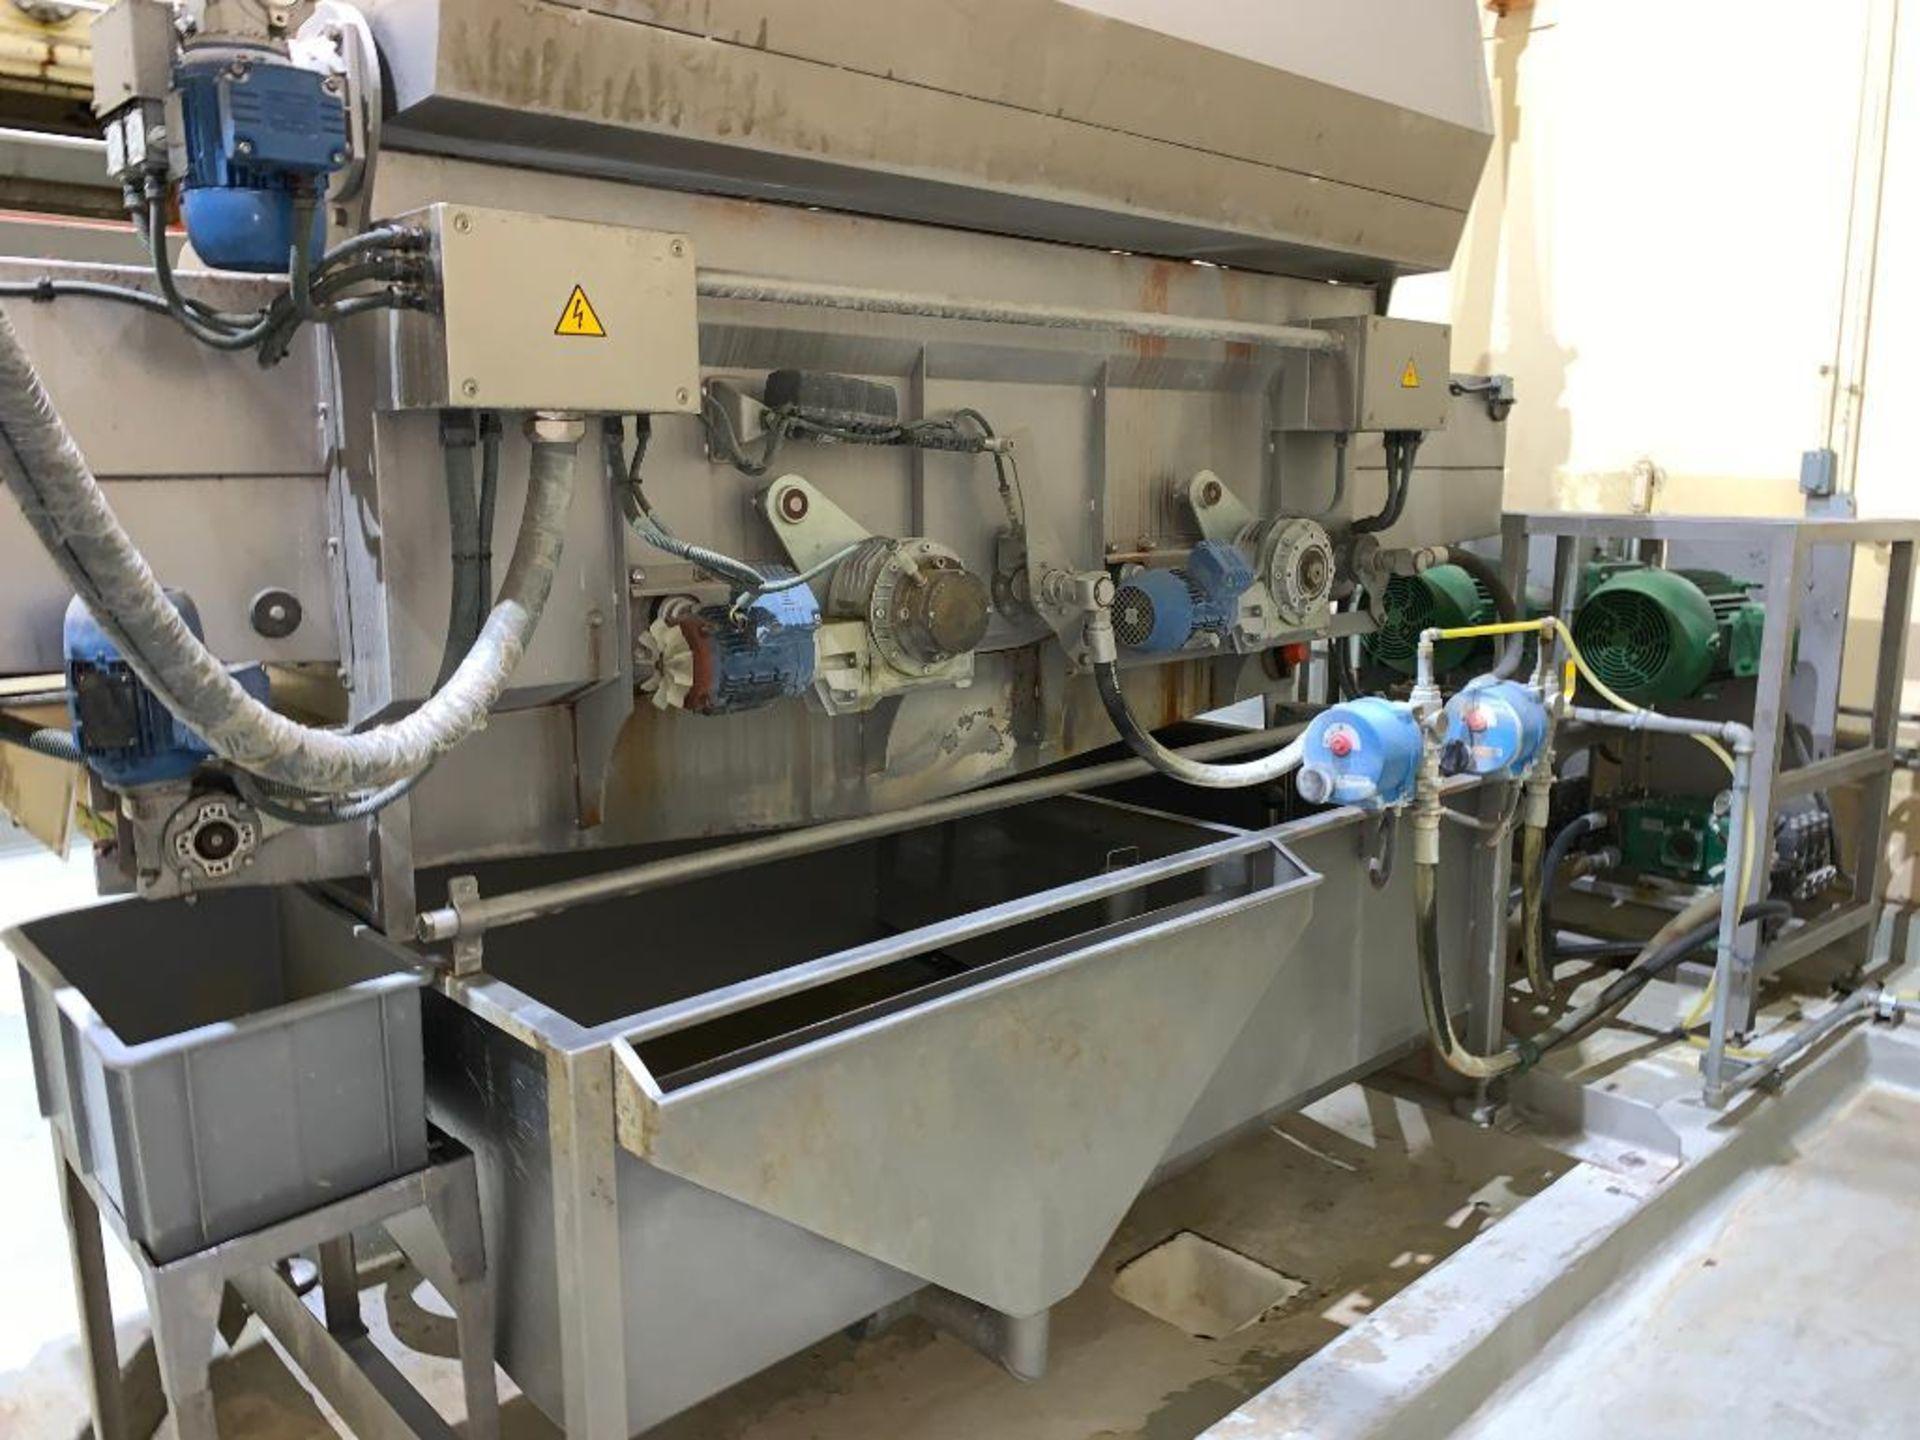 2013 Landucci die wash cabinet - Image 8 of 32